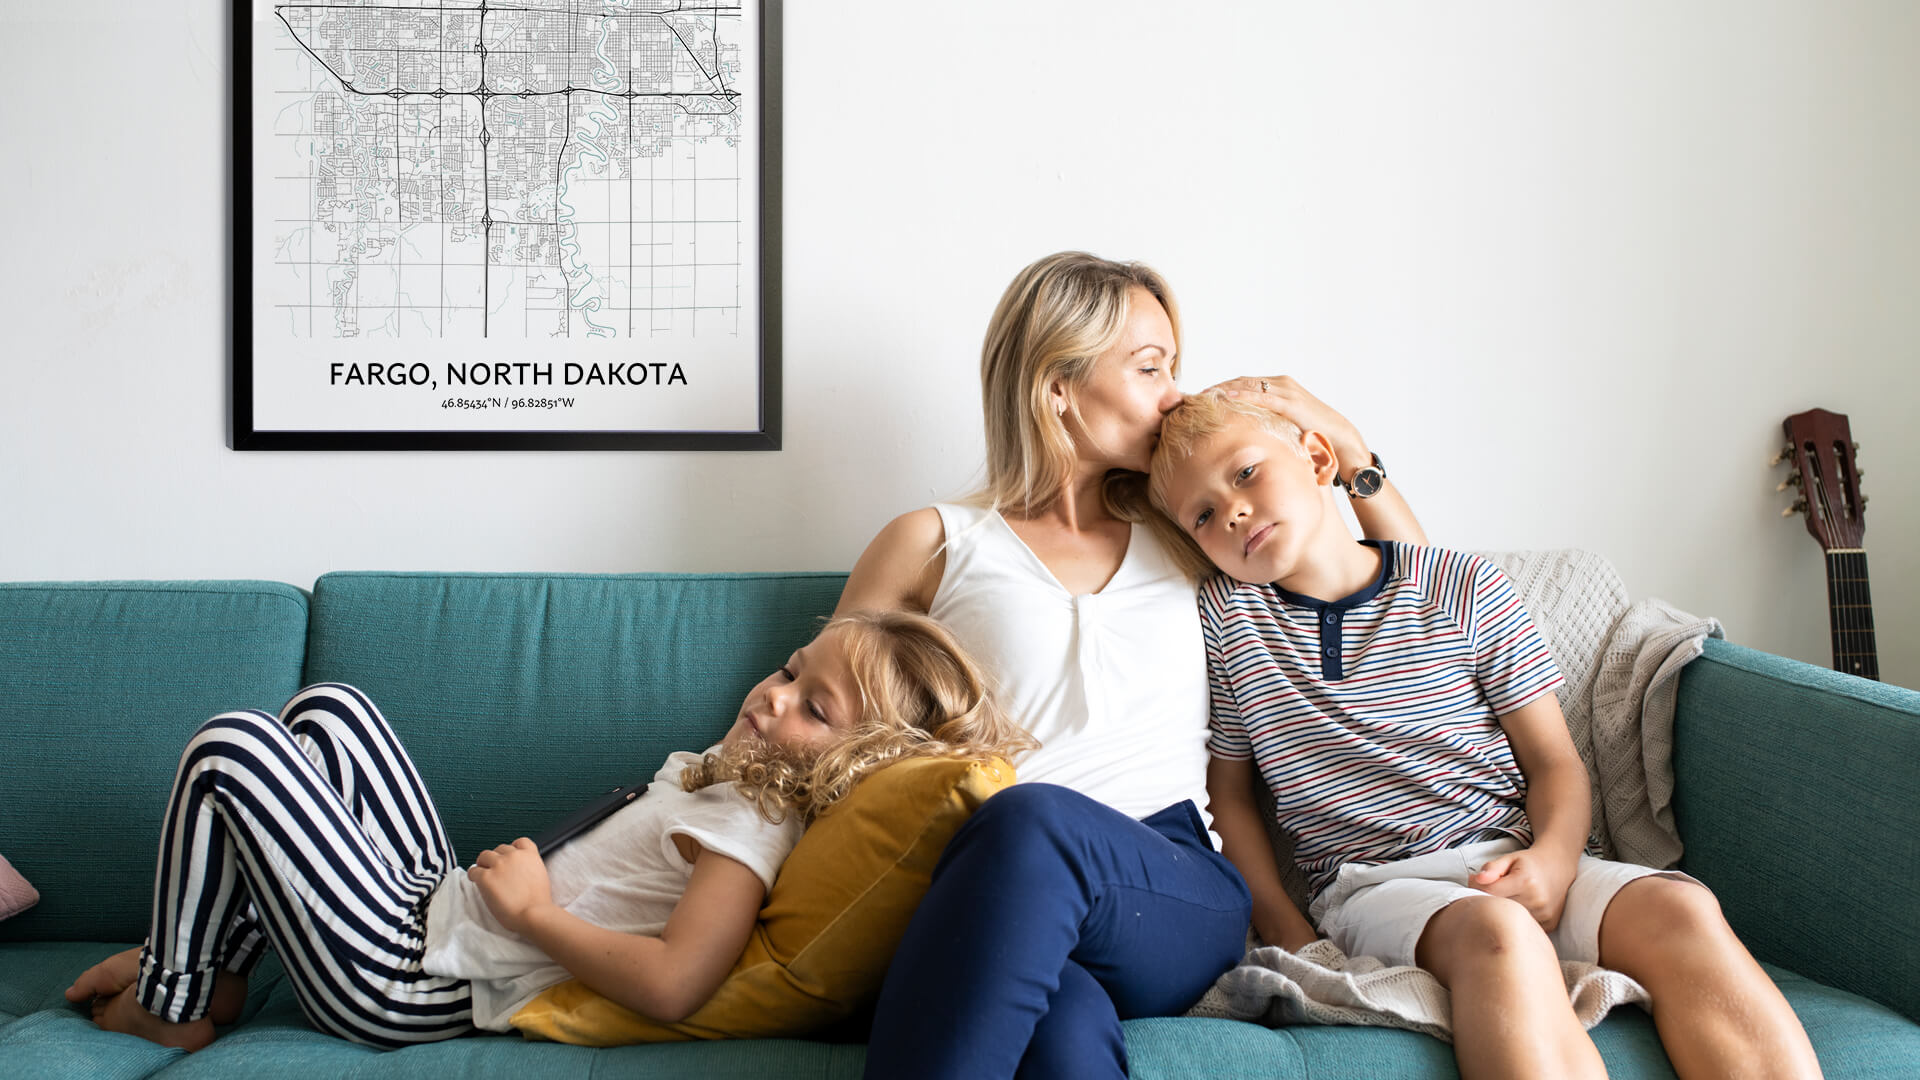 Fargo map poster